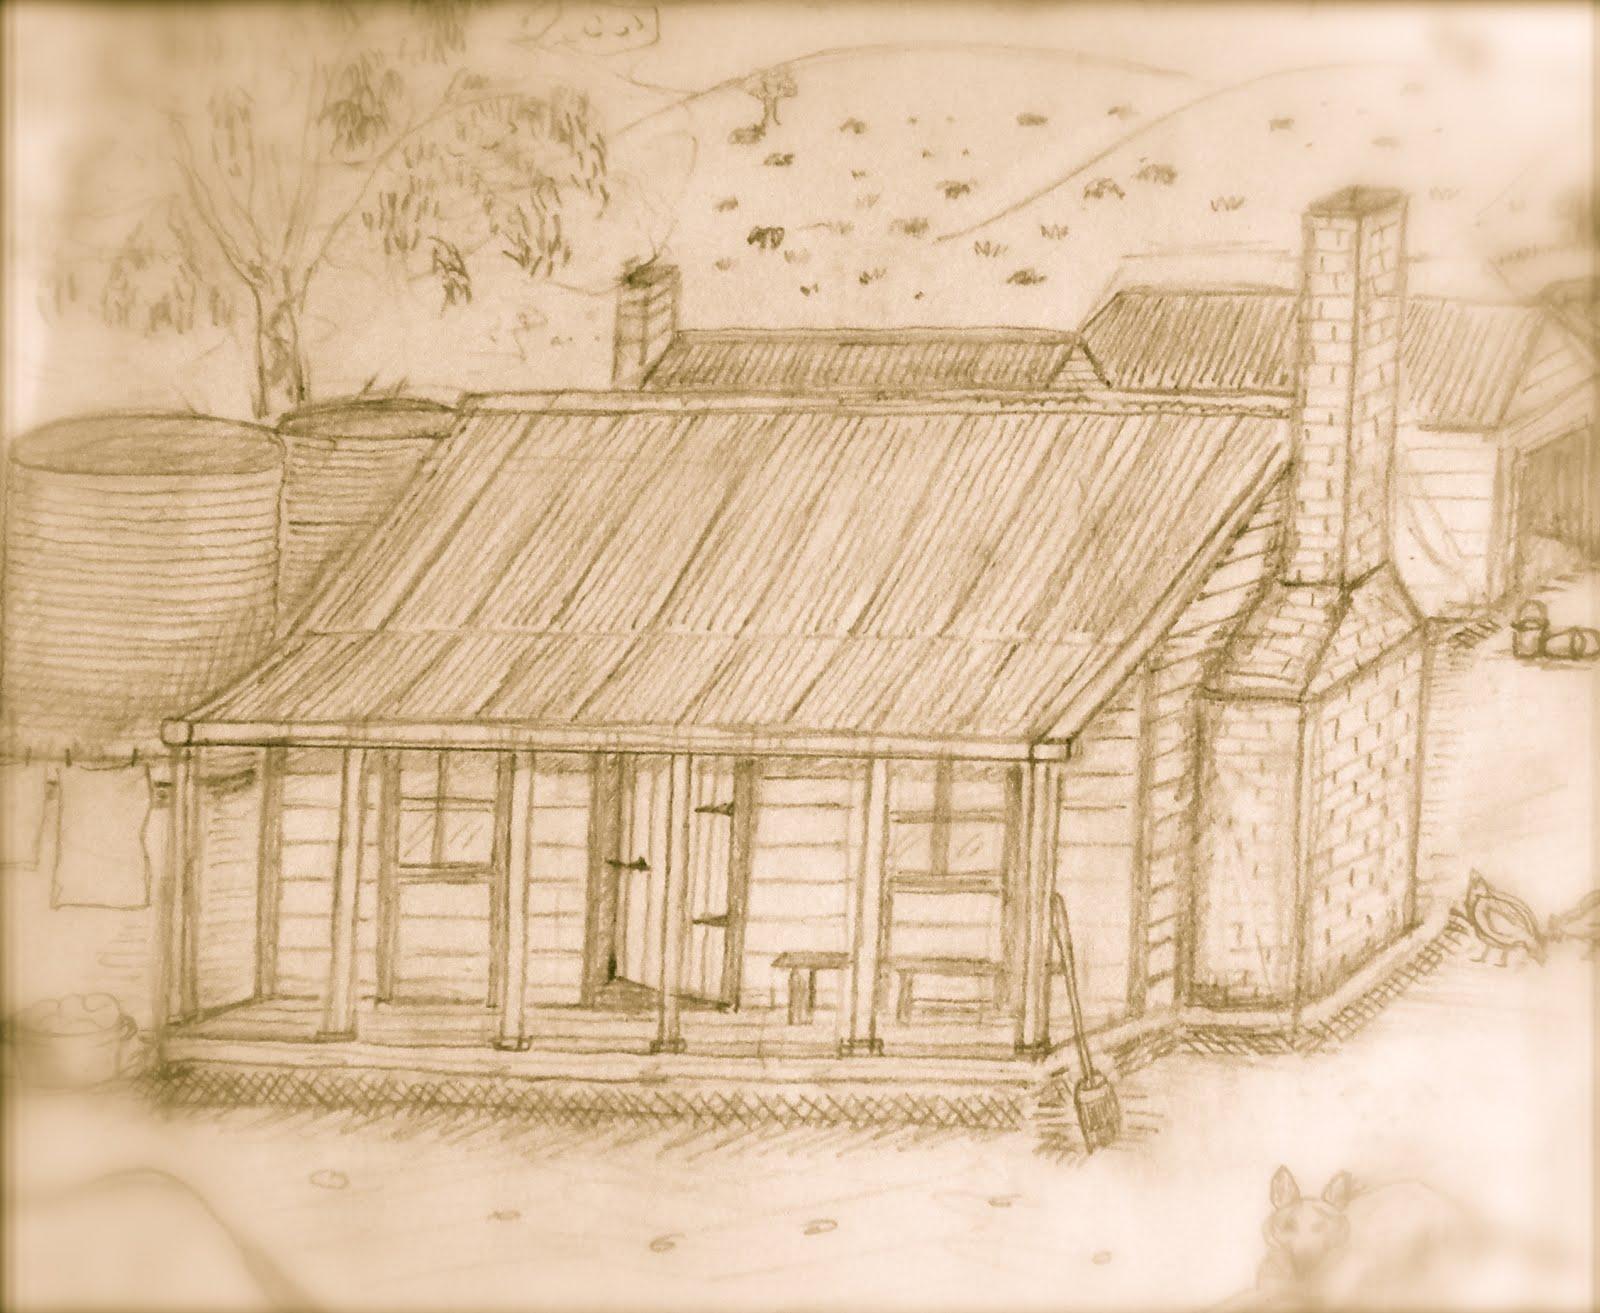 19th century Australian selector's homestead